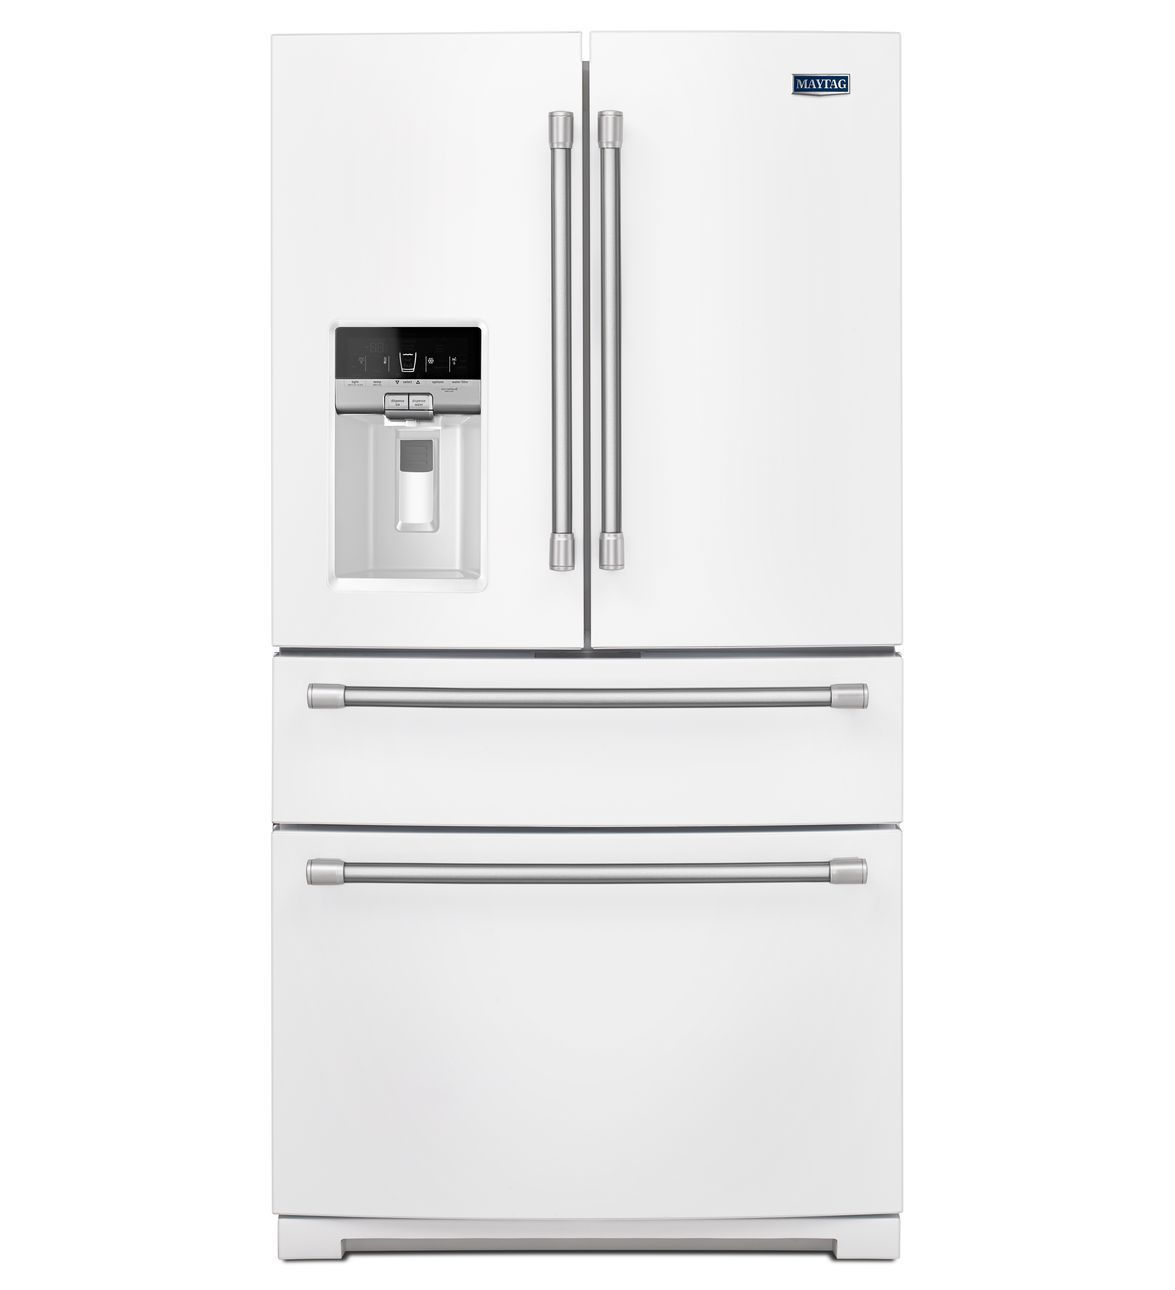 Maytag White 4 Door French Door Refrigerator With Steel Shelves